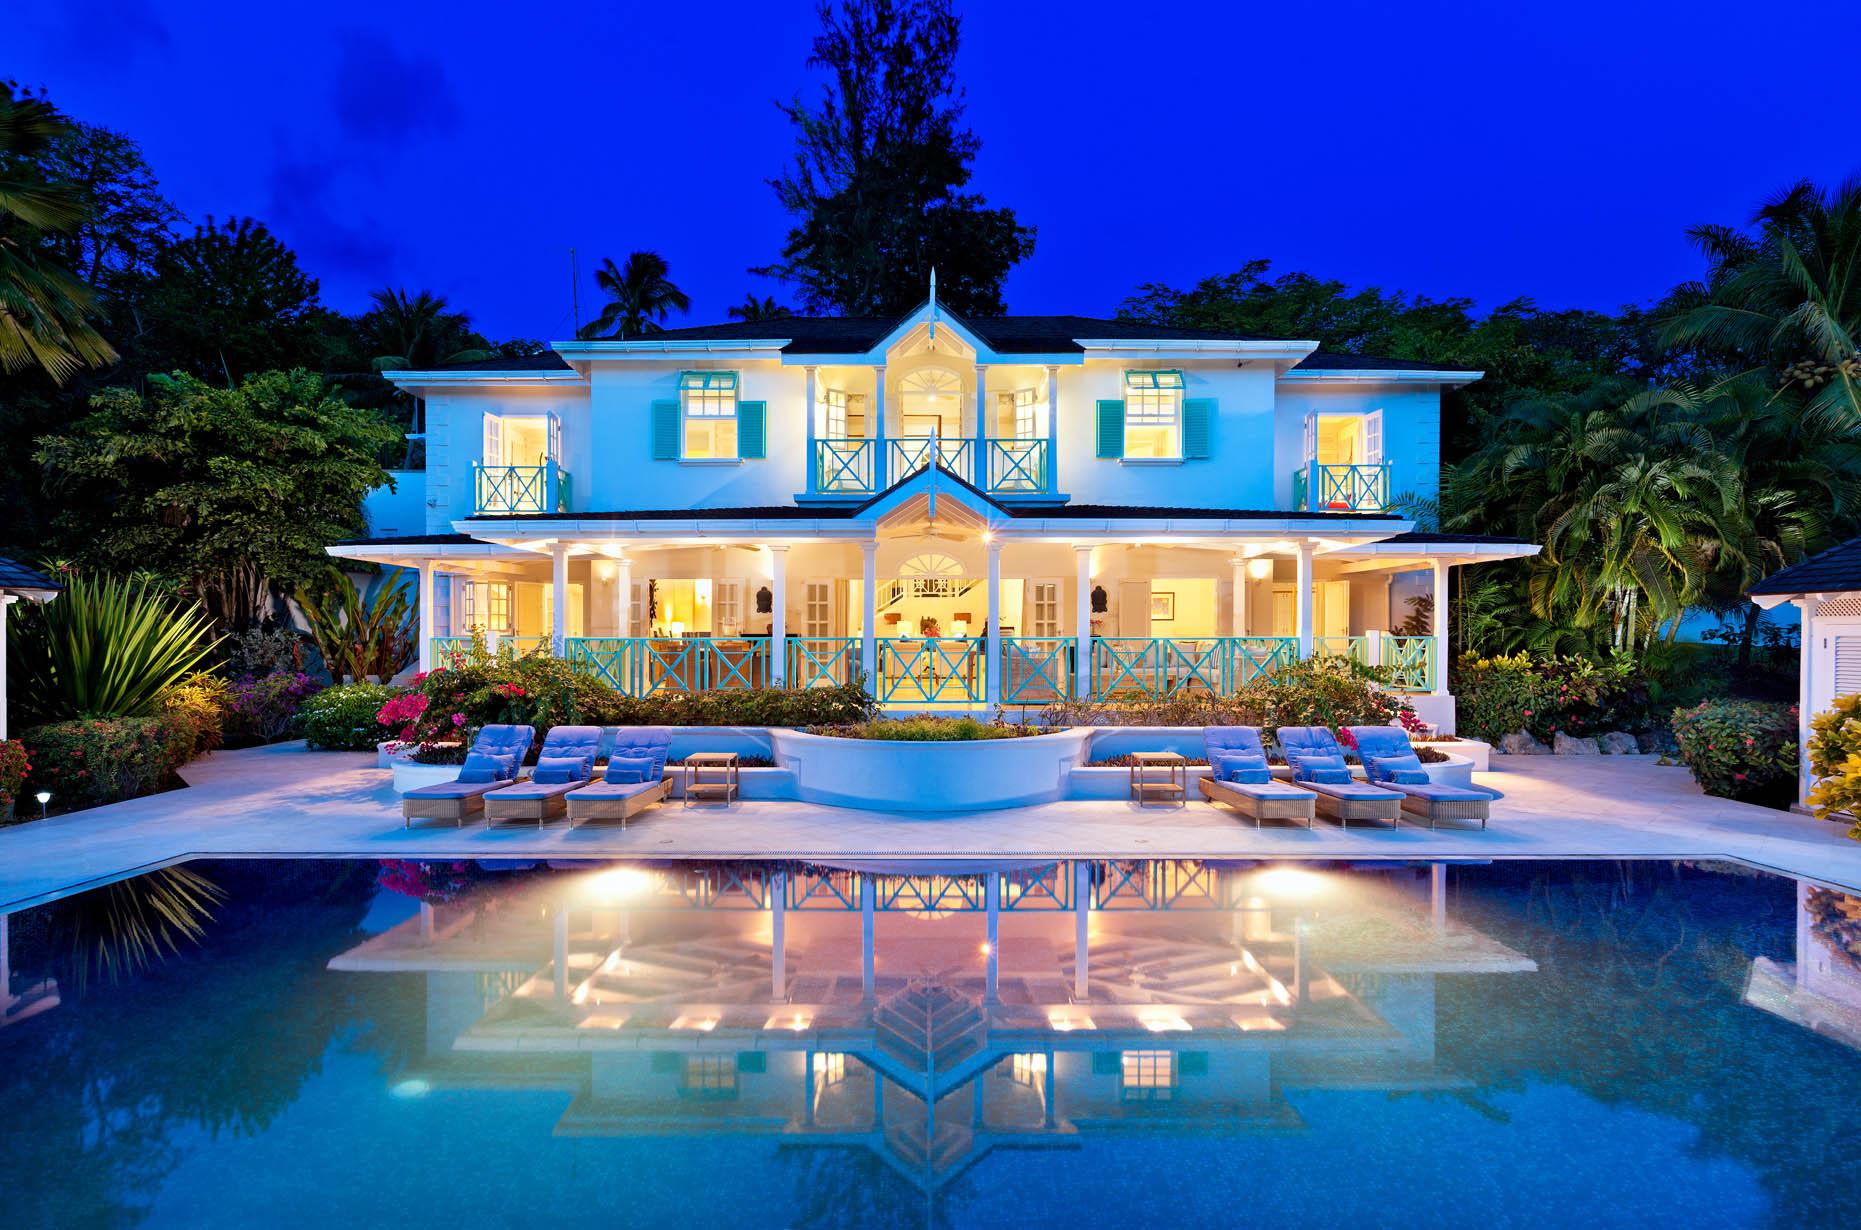 Twilight Bedroom Set Moondance Villa Barbados First Hampton International